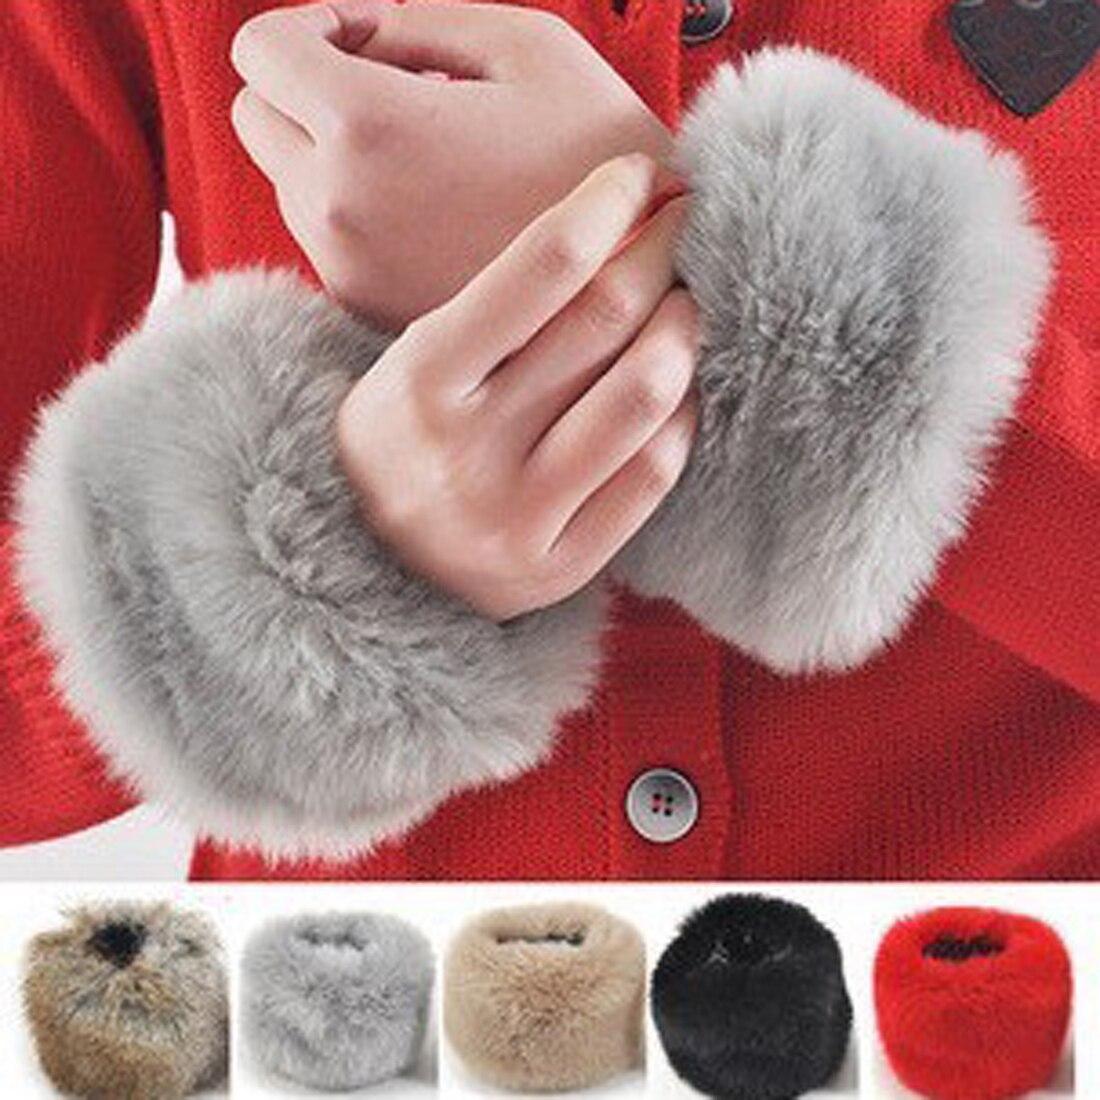 Faux Fur Wrist Slap Women Fashion Winter Elastic Wrist Slap On Cuffs Ladies Solid Color Arm Warmer Plush Wrist Protector 1 Pair